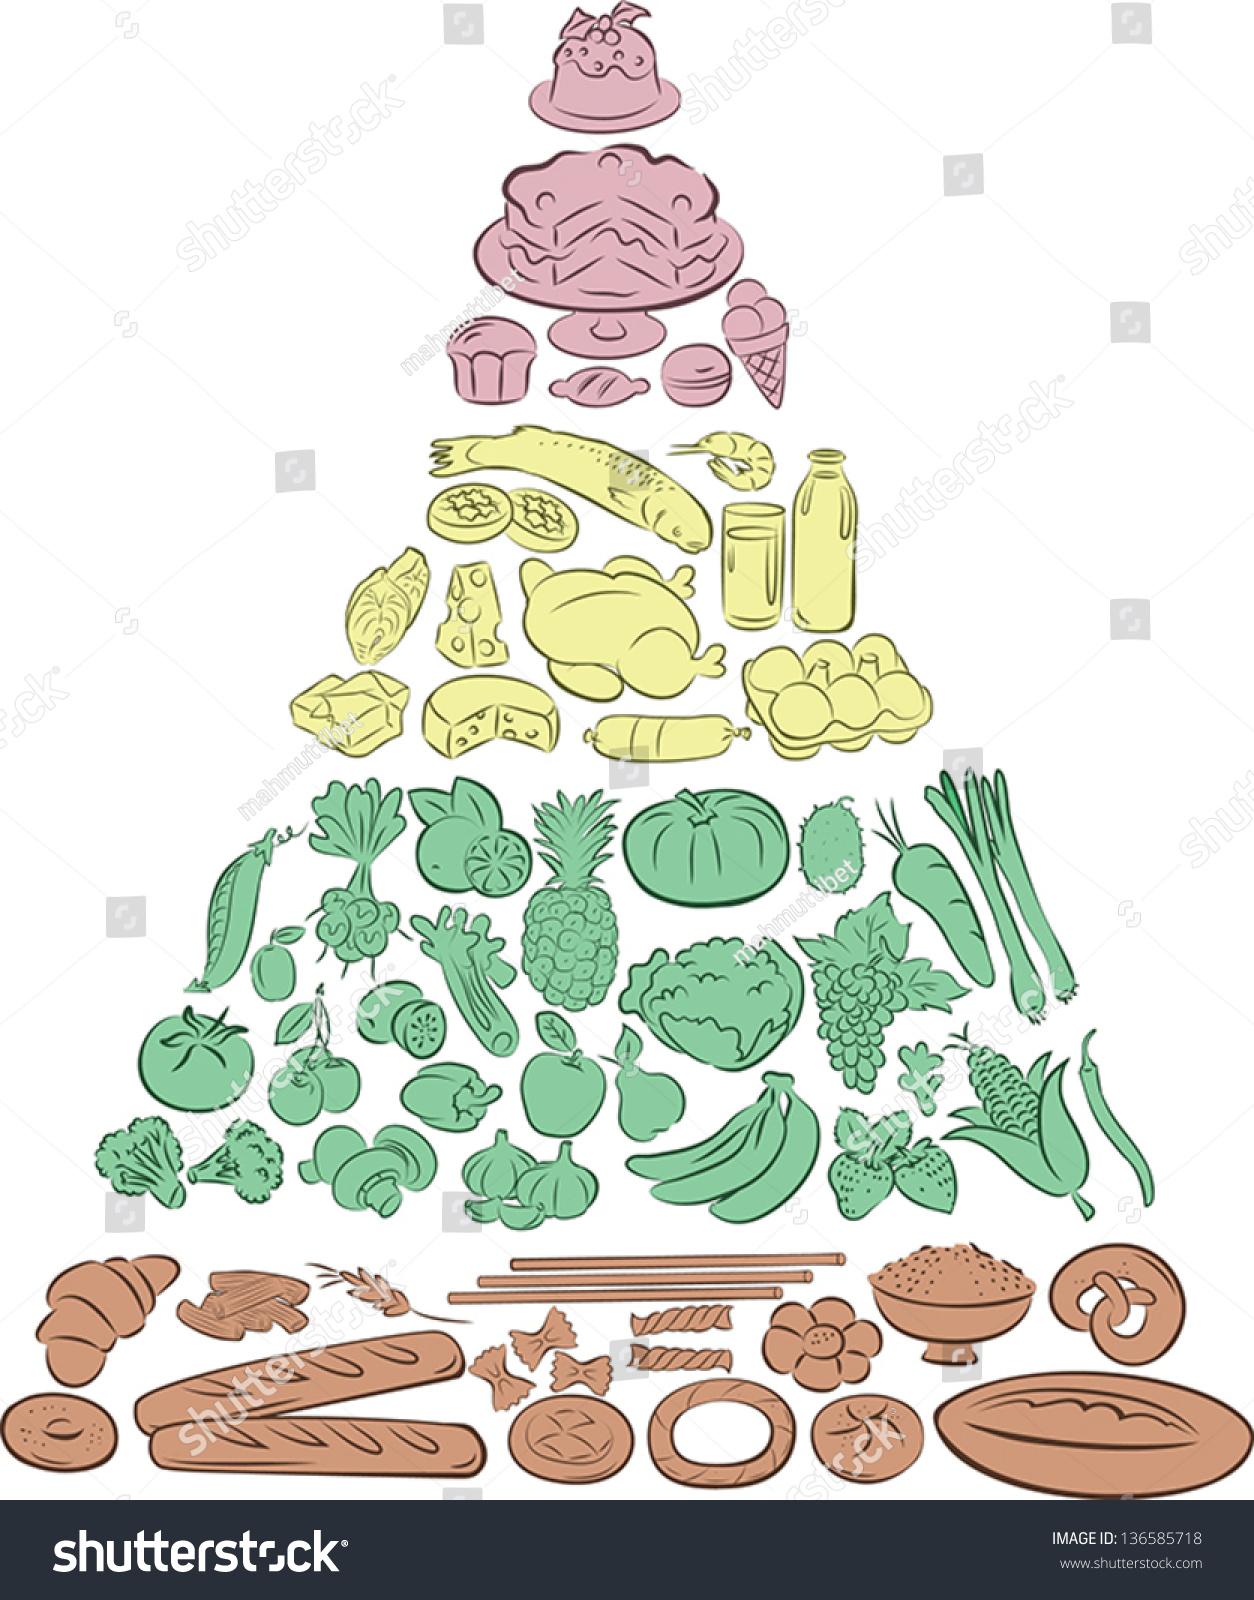 Vector Illustration Food Pyramid Showing Main Stock Vector ...